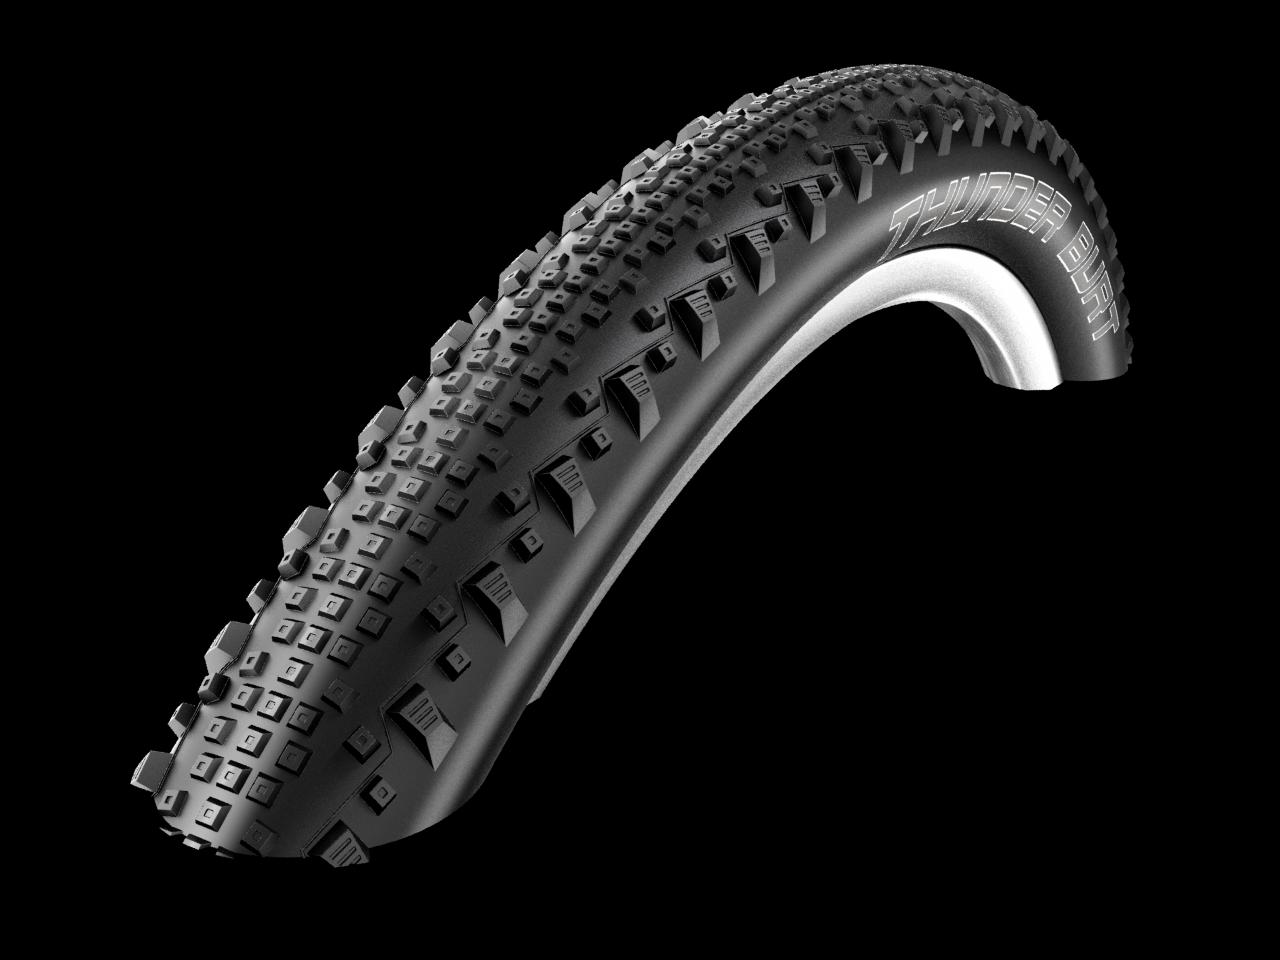 Nye mountainbike dæk fra Schwalbe